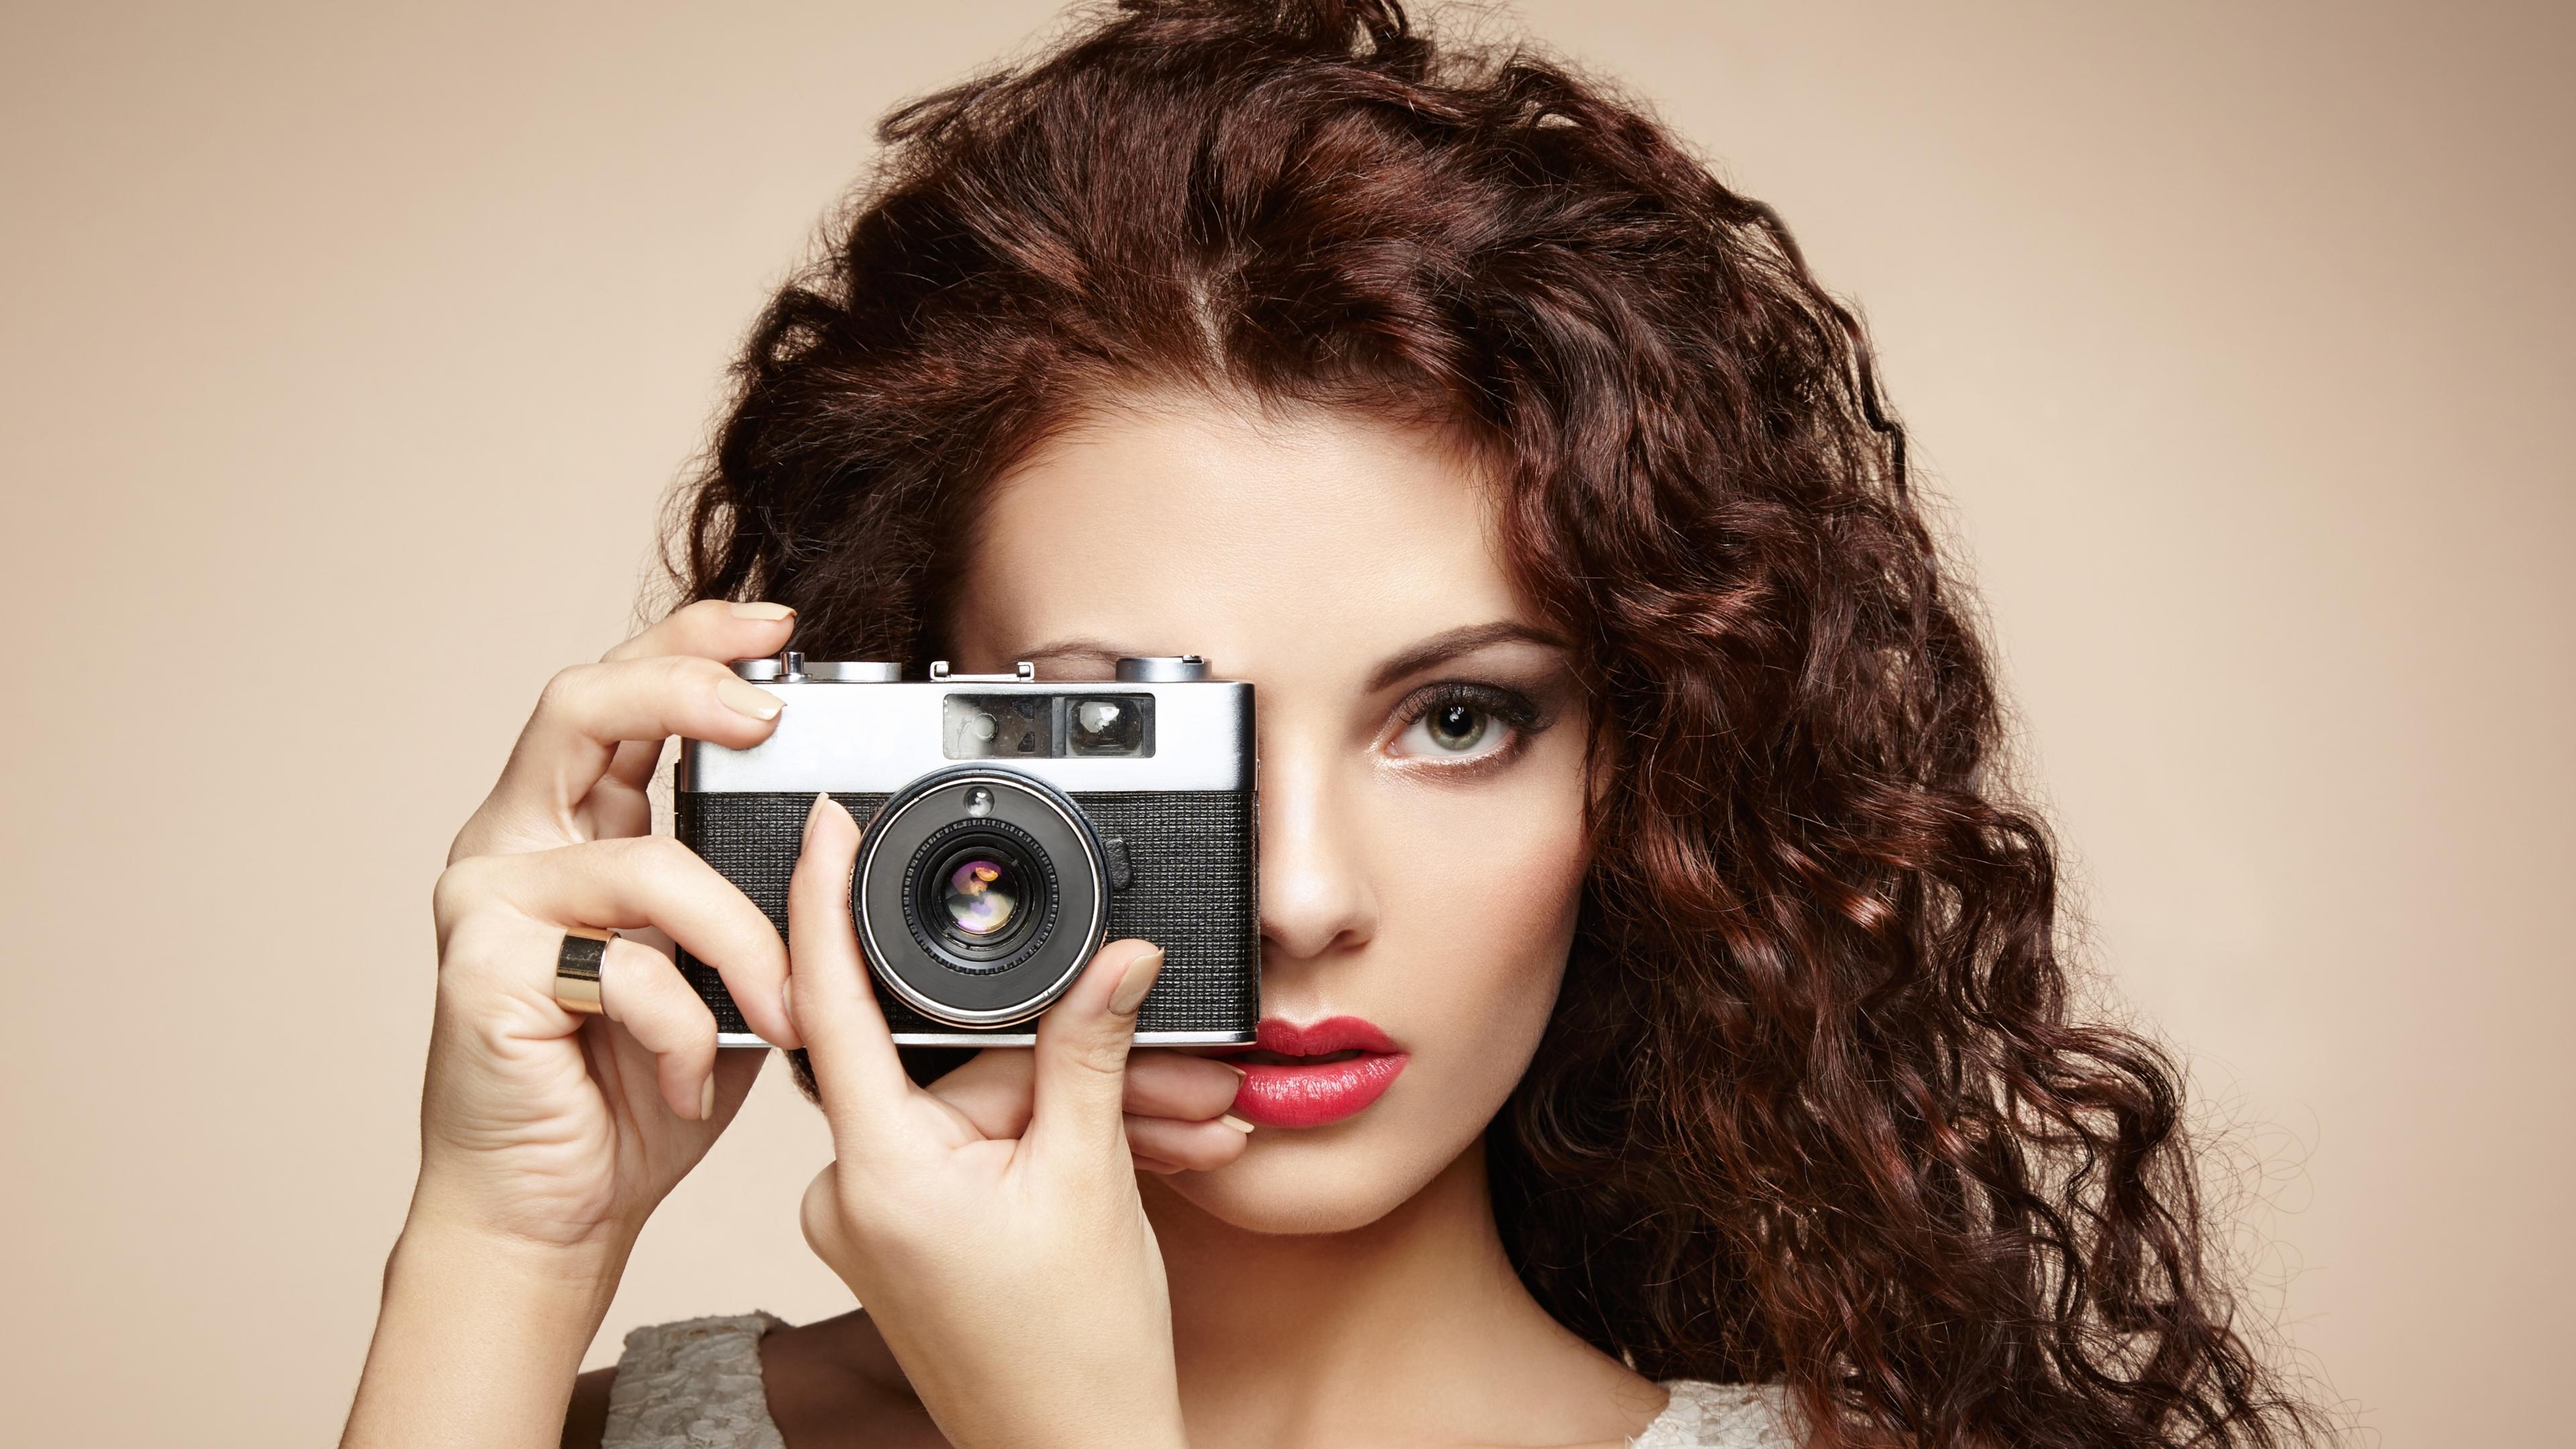 Beautiful Girl Photography Hd 3840x2160 Download Hd Wallpaper Wallpapertip